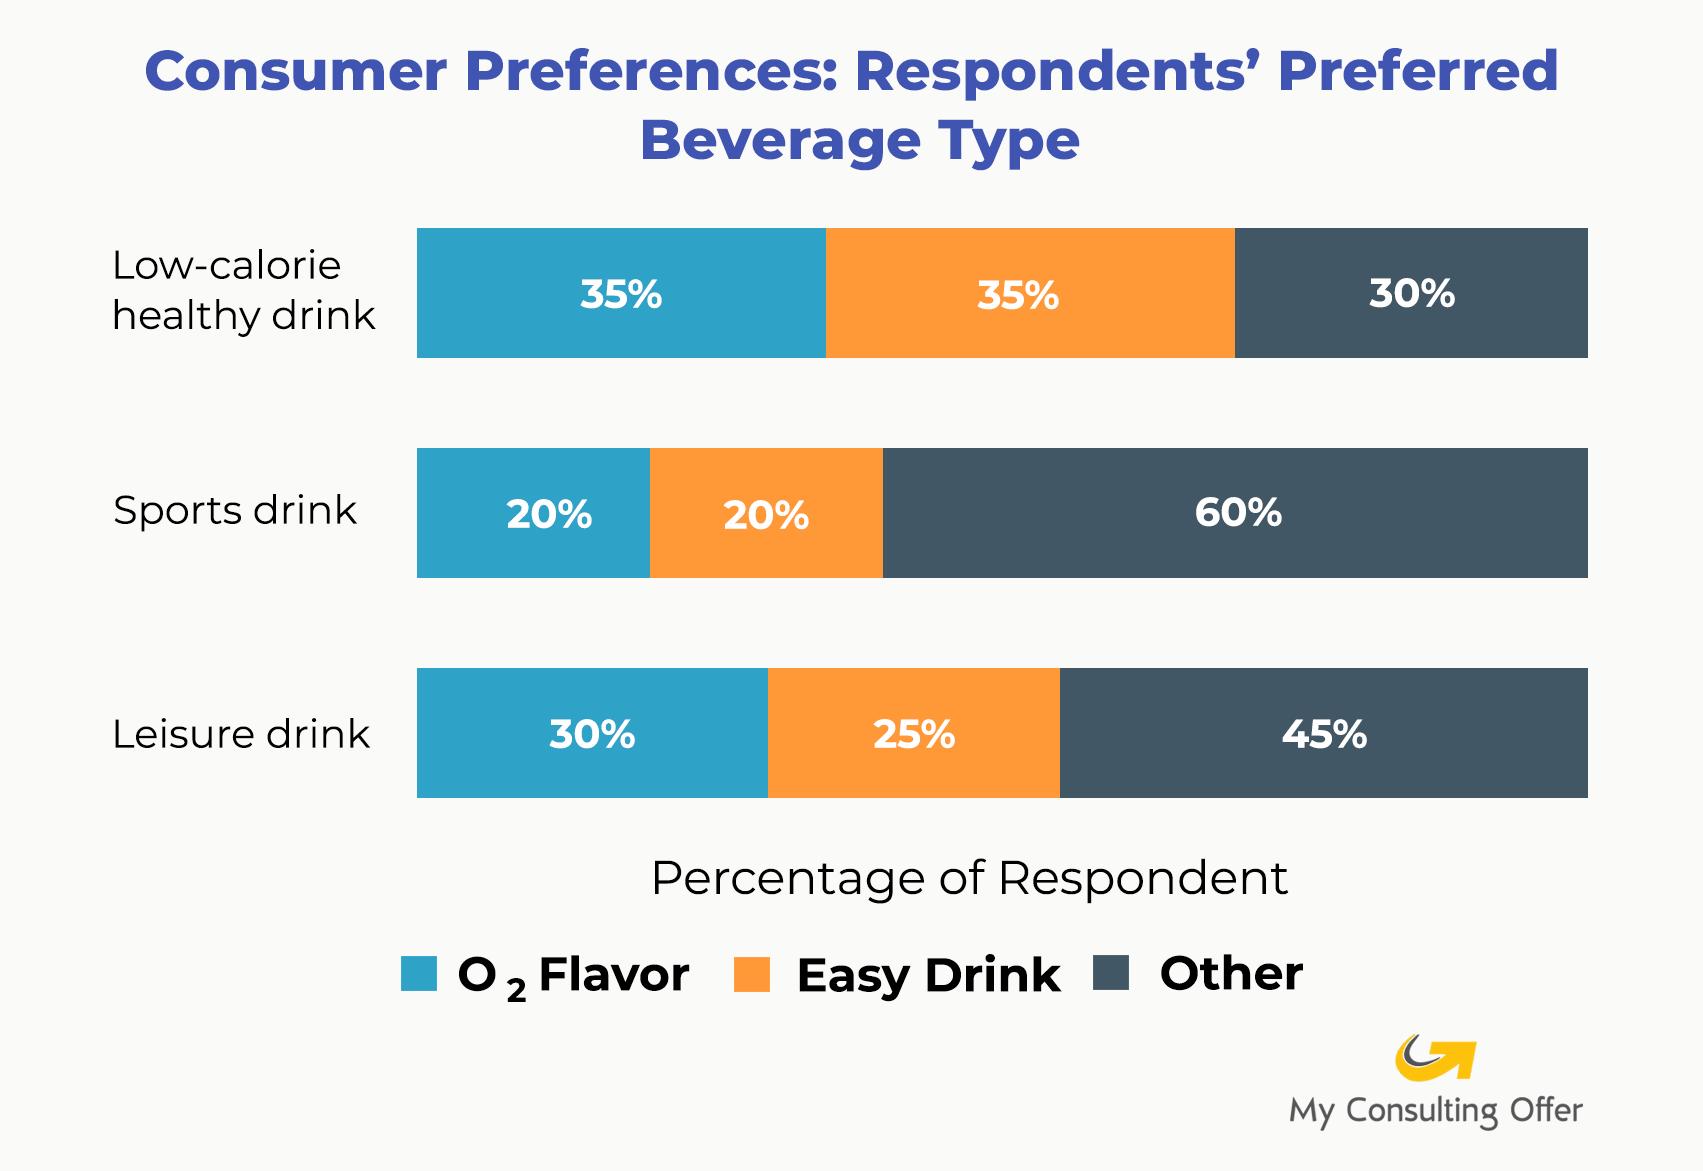 Consumer Preferences: Respondents' Preferred Beverage type